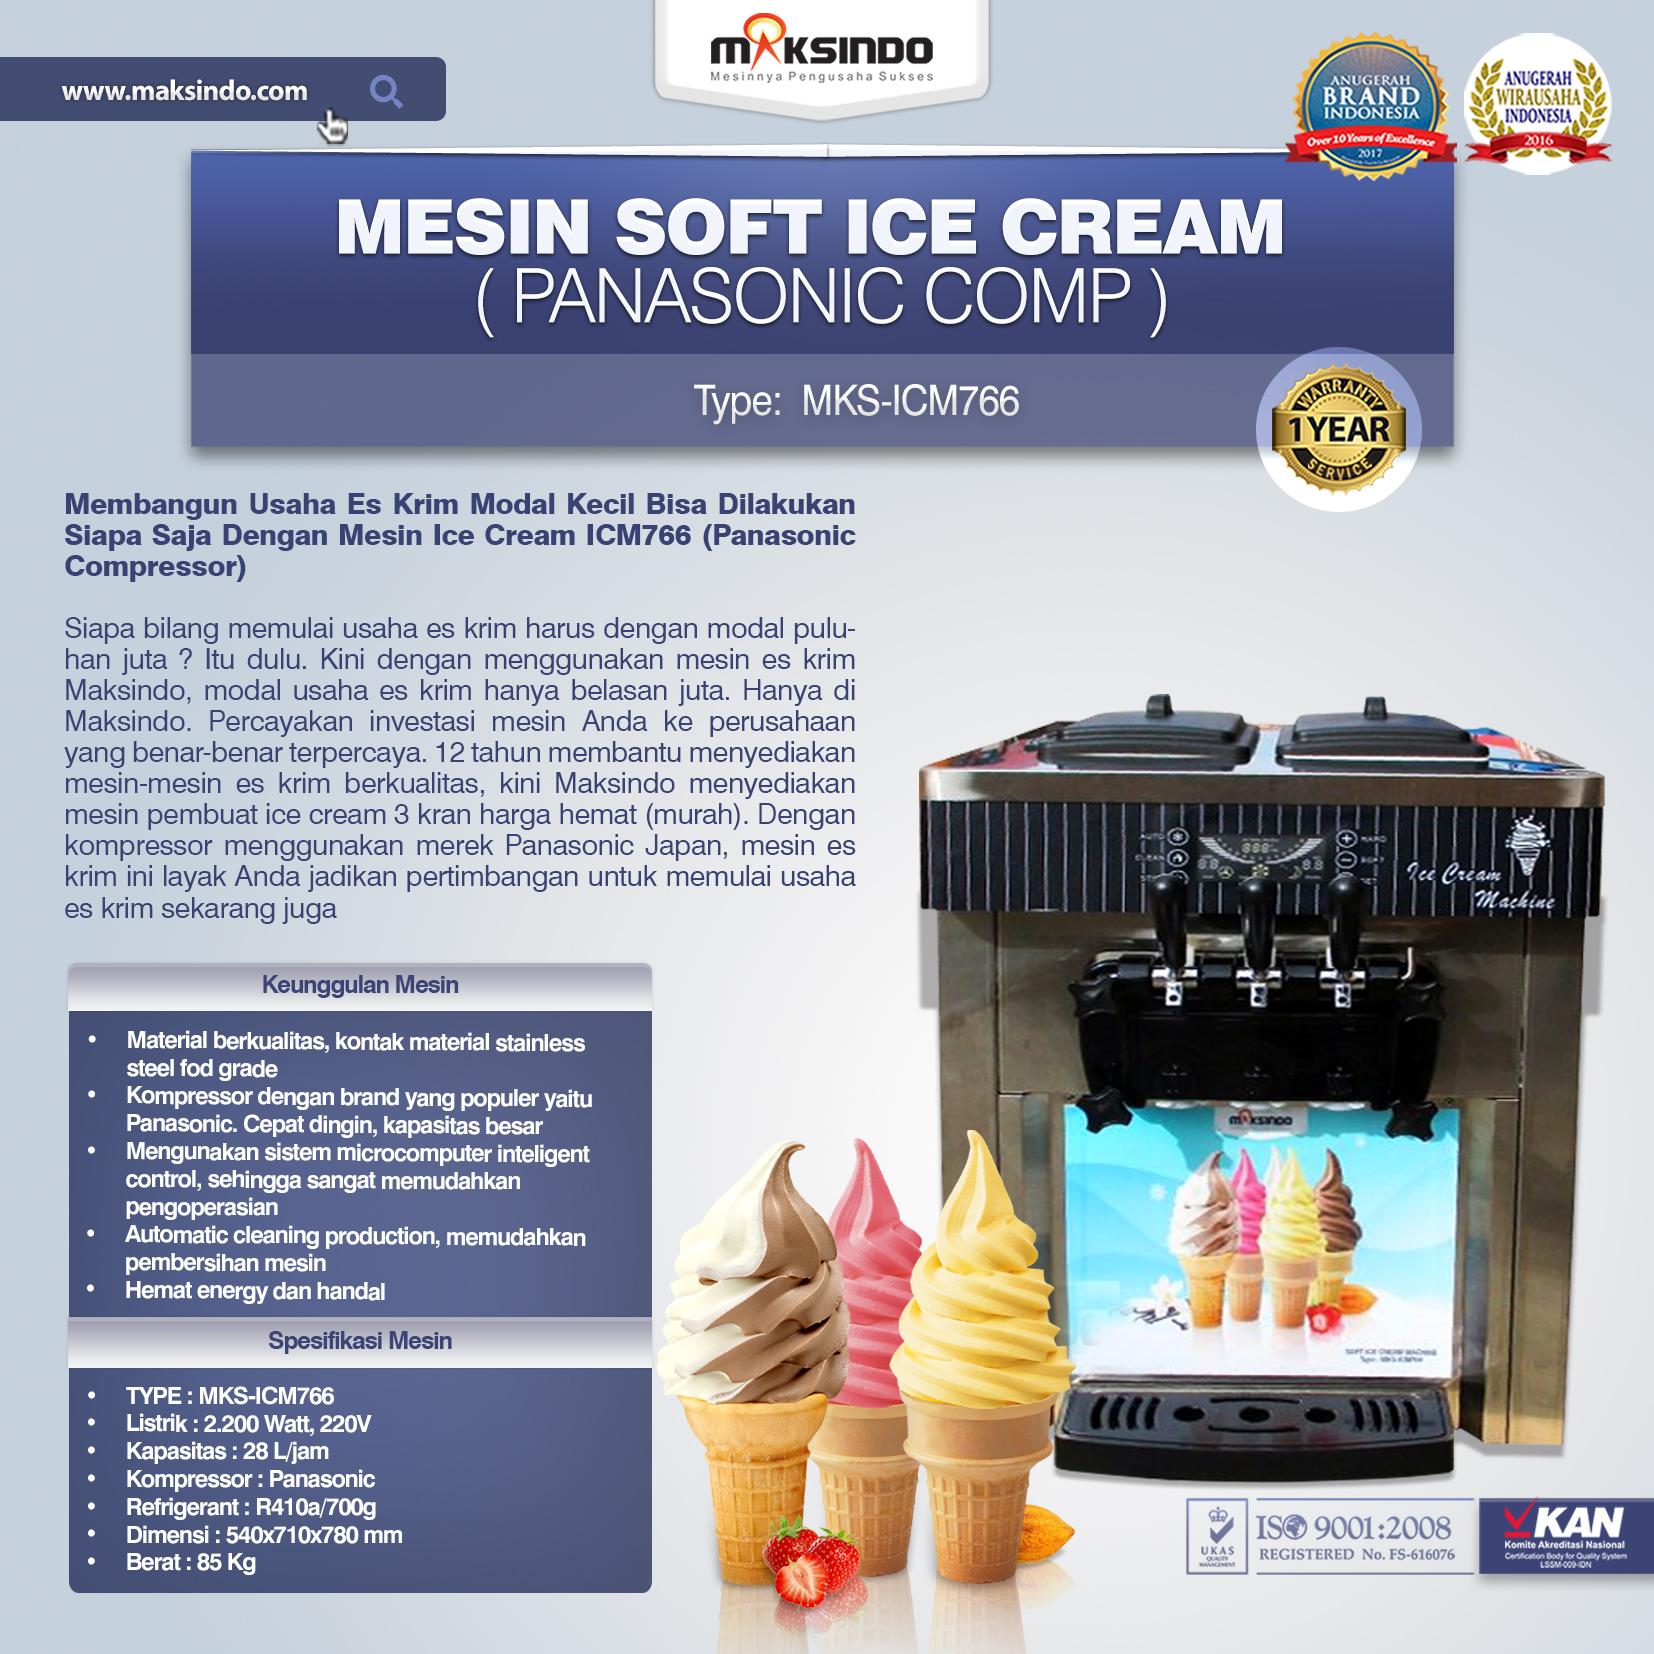 Jual Mesin Soft Ice Cream ICM766 (Panasonic Comp) di Palembang